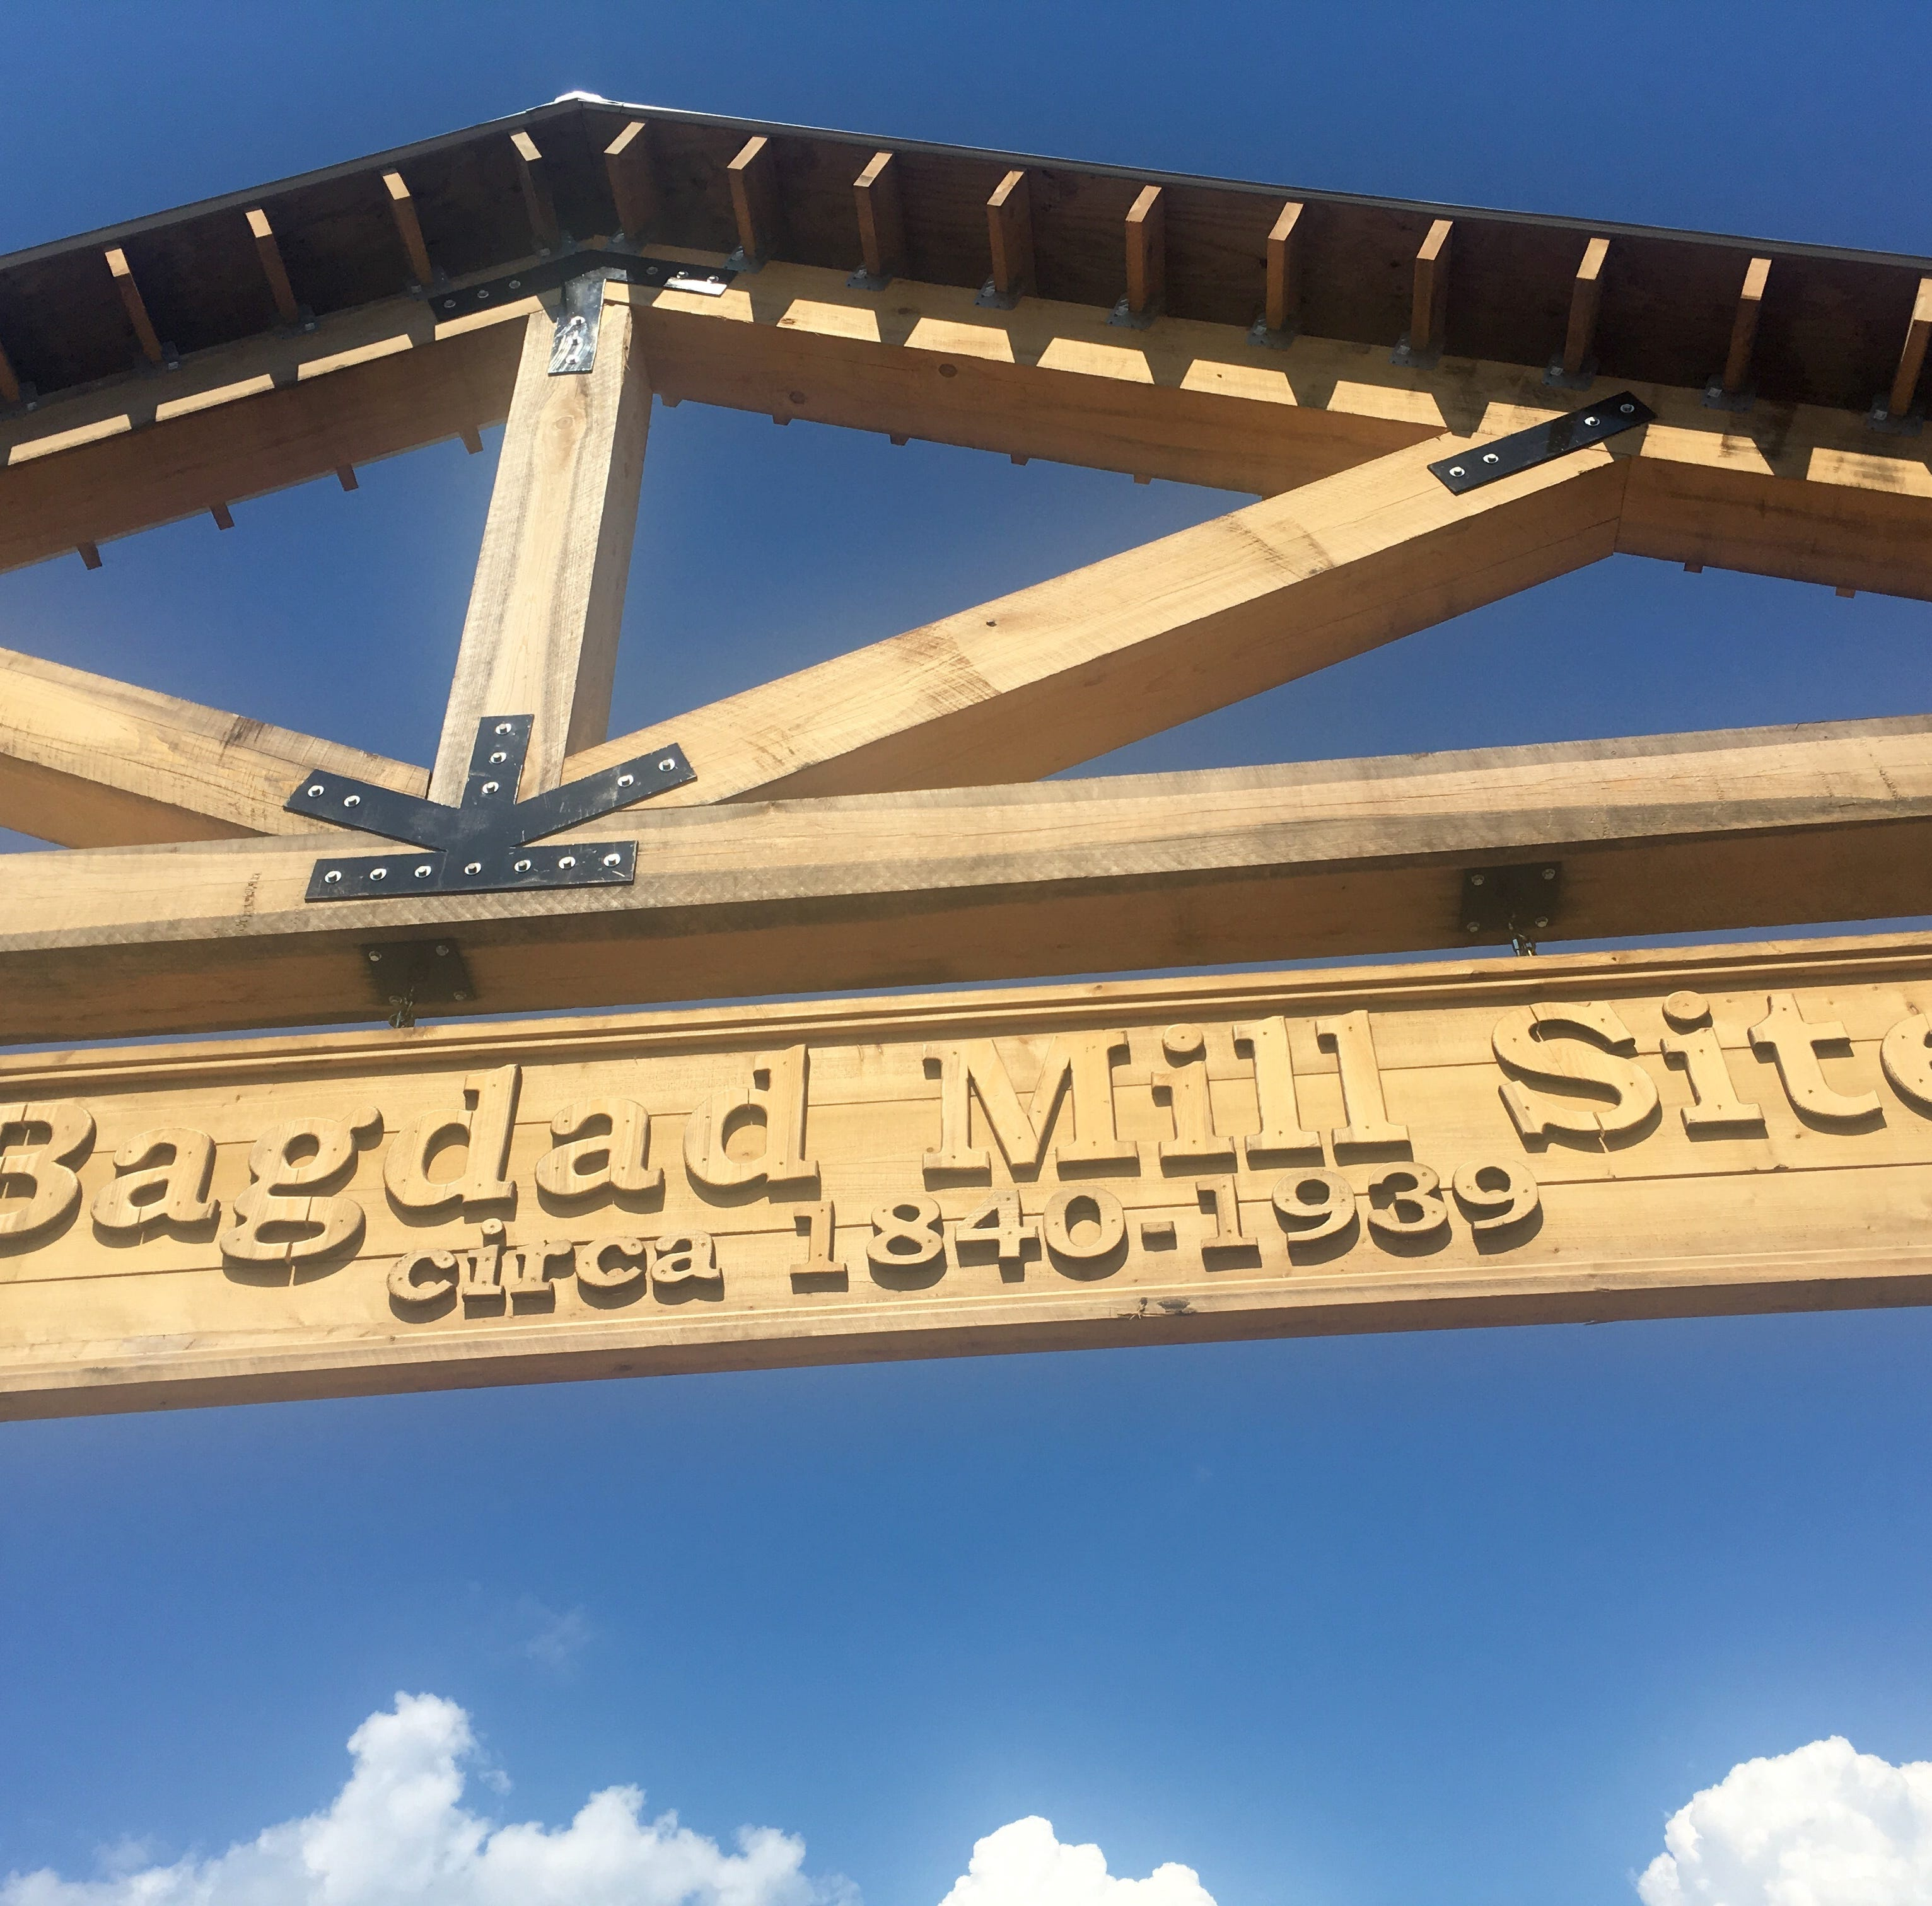 Bagdad was once the place in Northwest Florida to seek prosperity | Appleyard